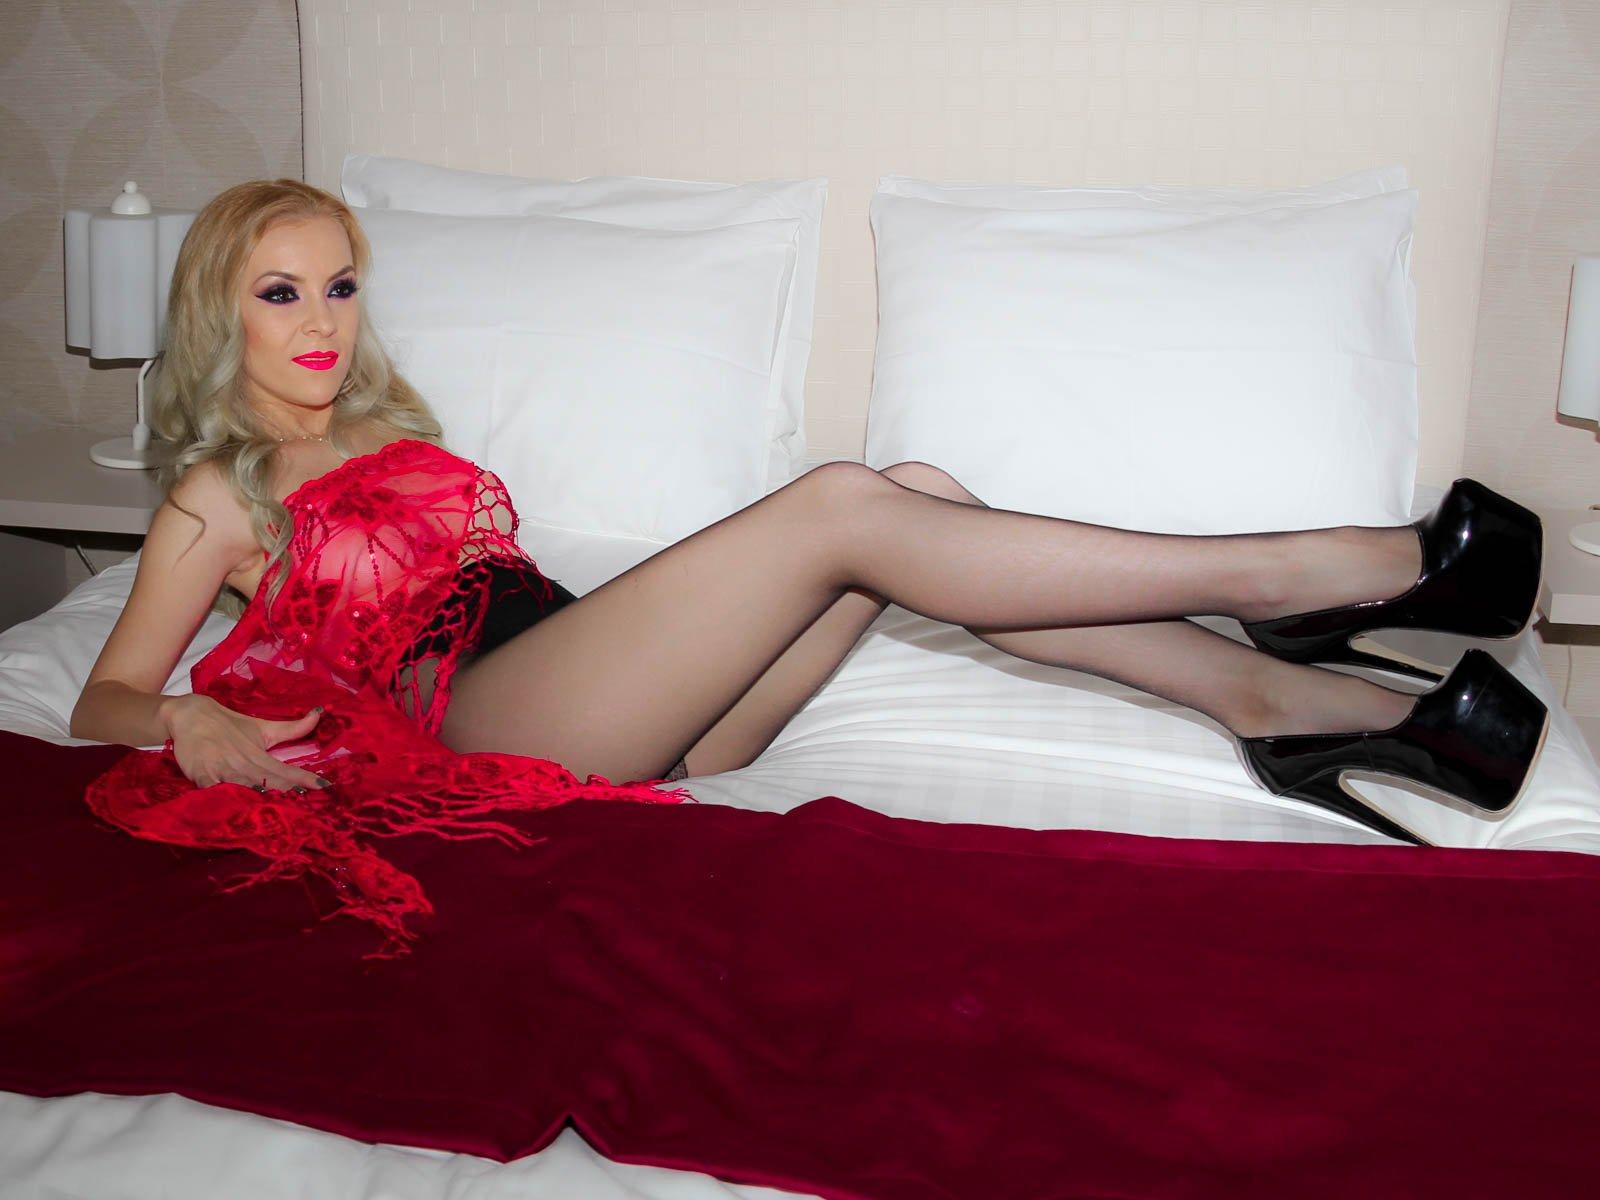 Francia dee sex video